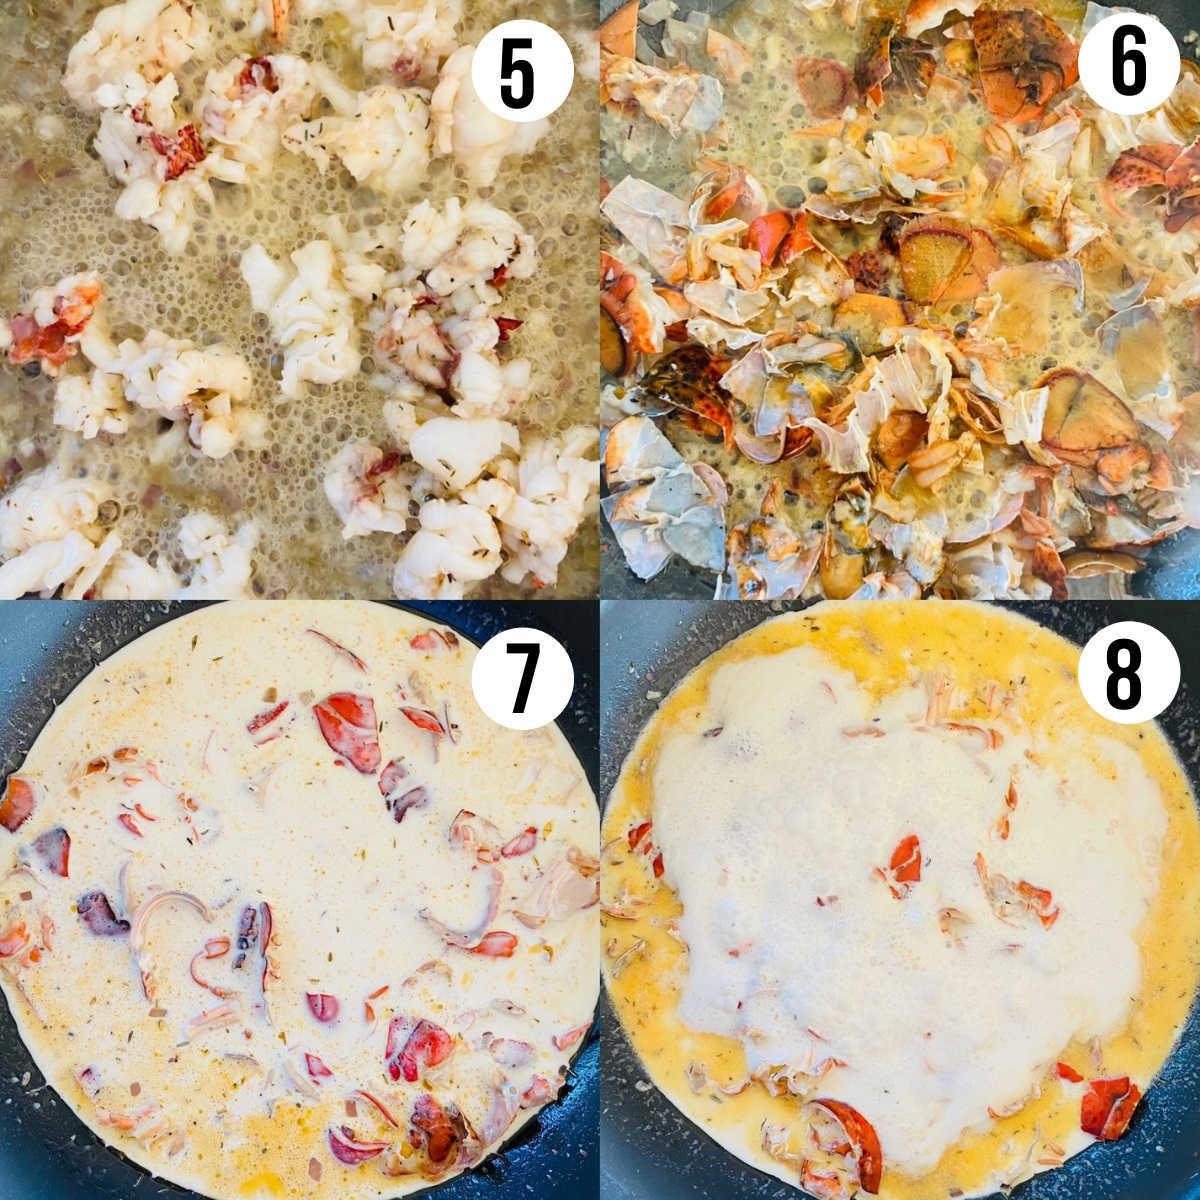 lobster ravioli sauce process shots 5-8